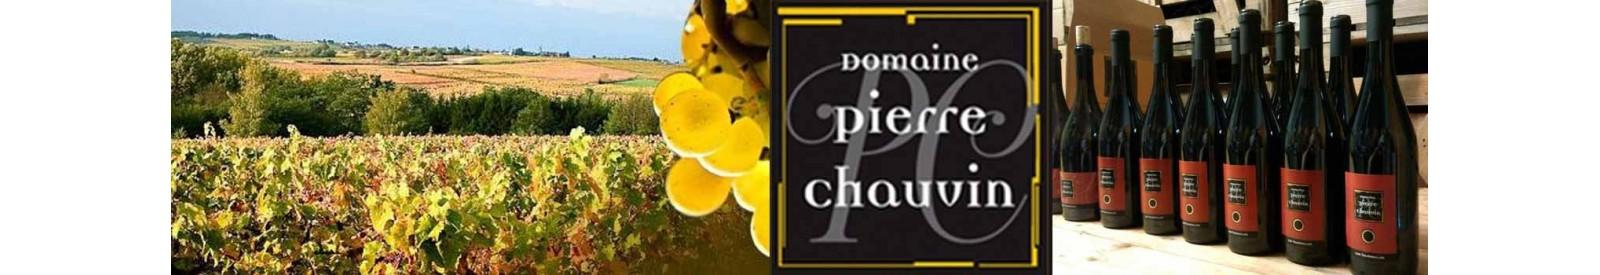 Domaine Pierre Chauvin - Anjou - Vin bio